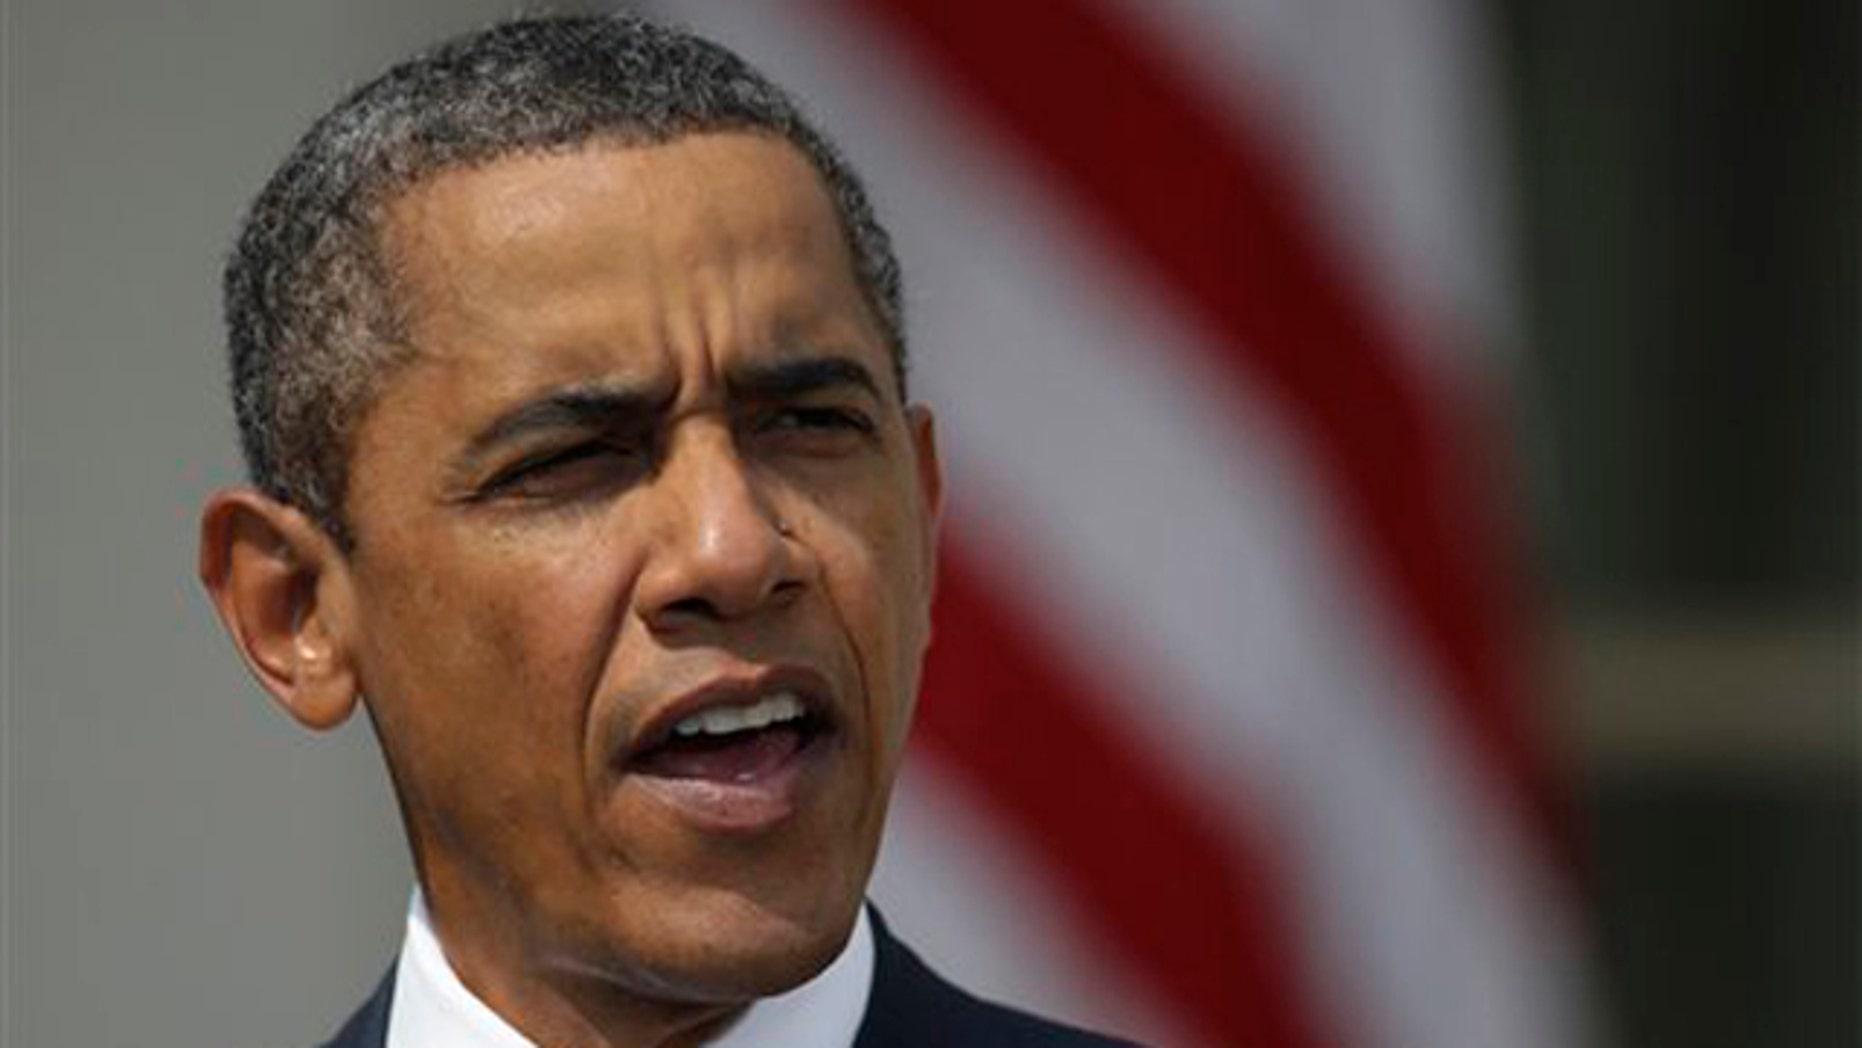 Monday: President Obama speaks in the Rose Garden in Washington.